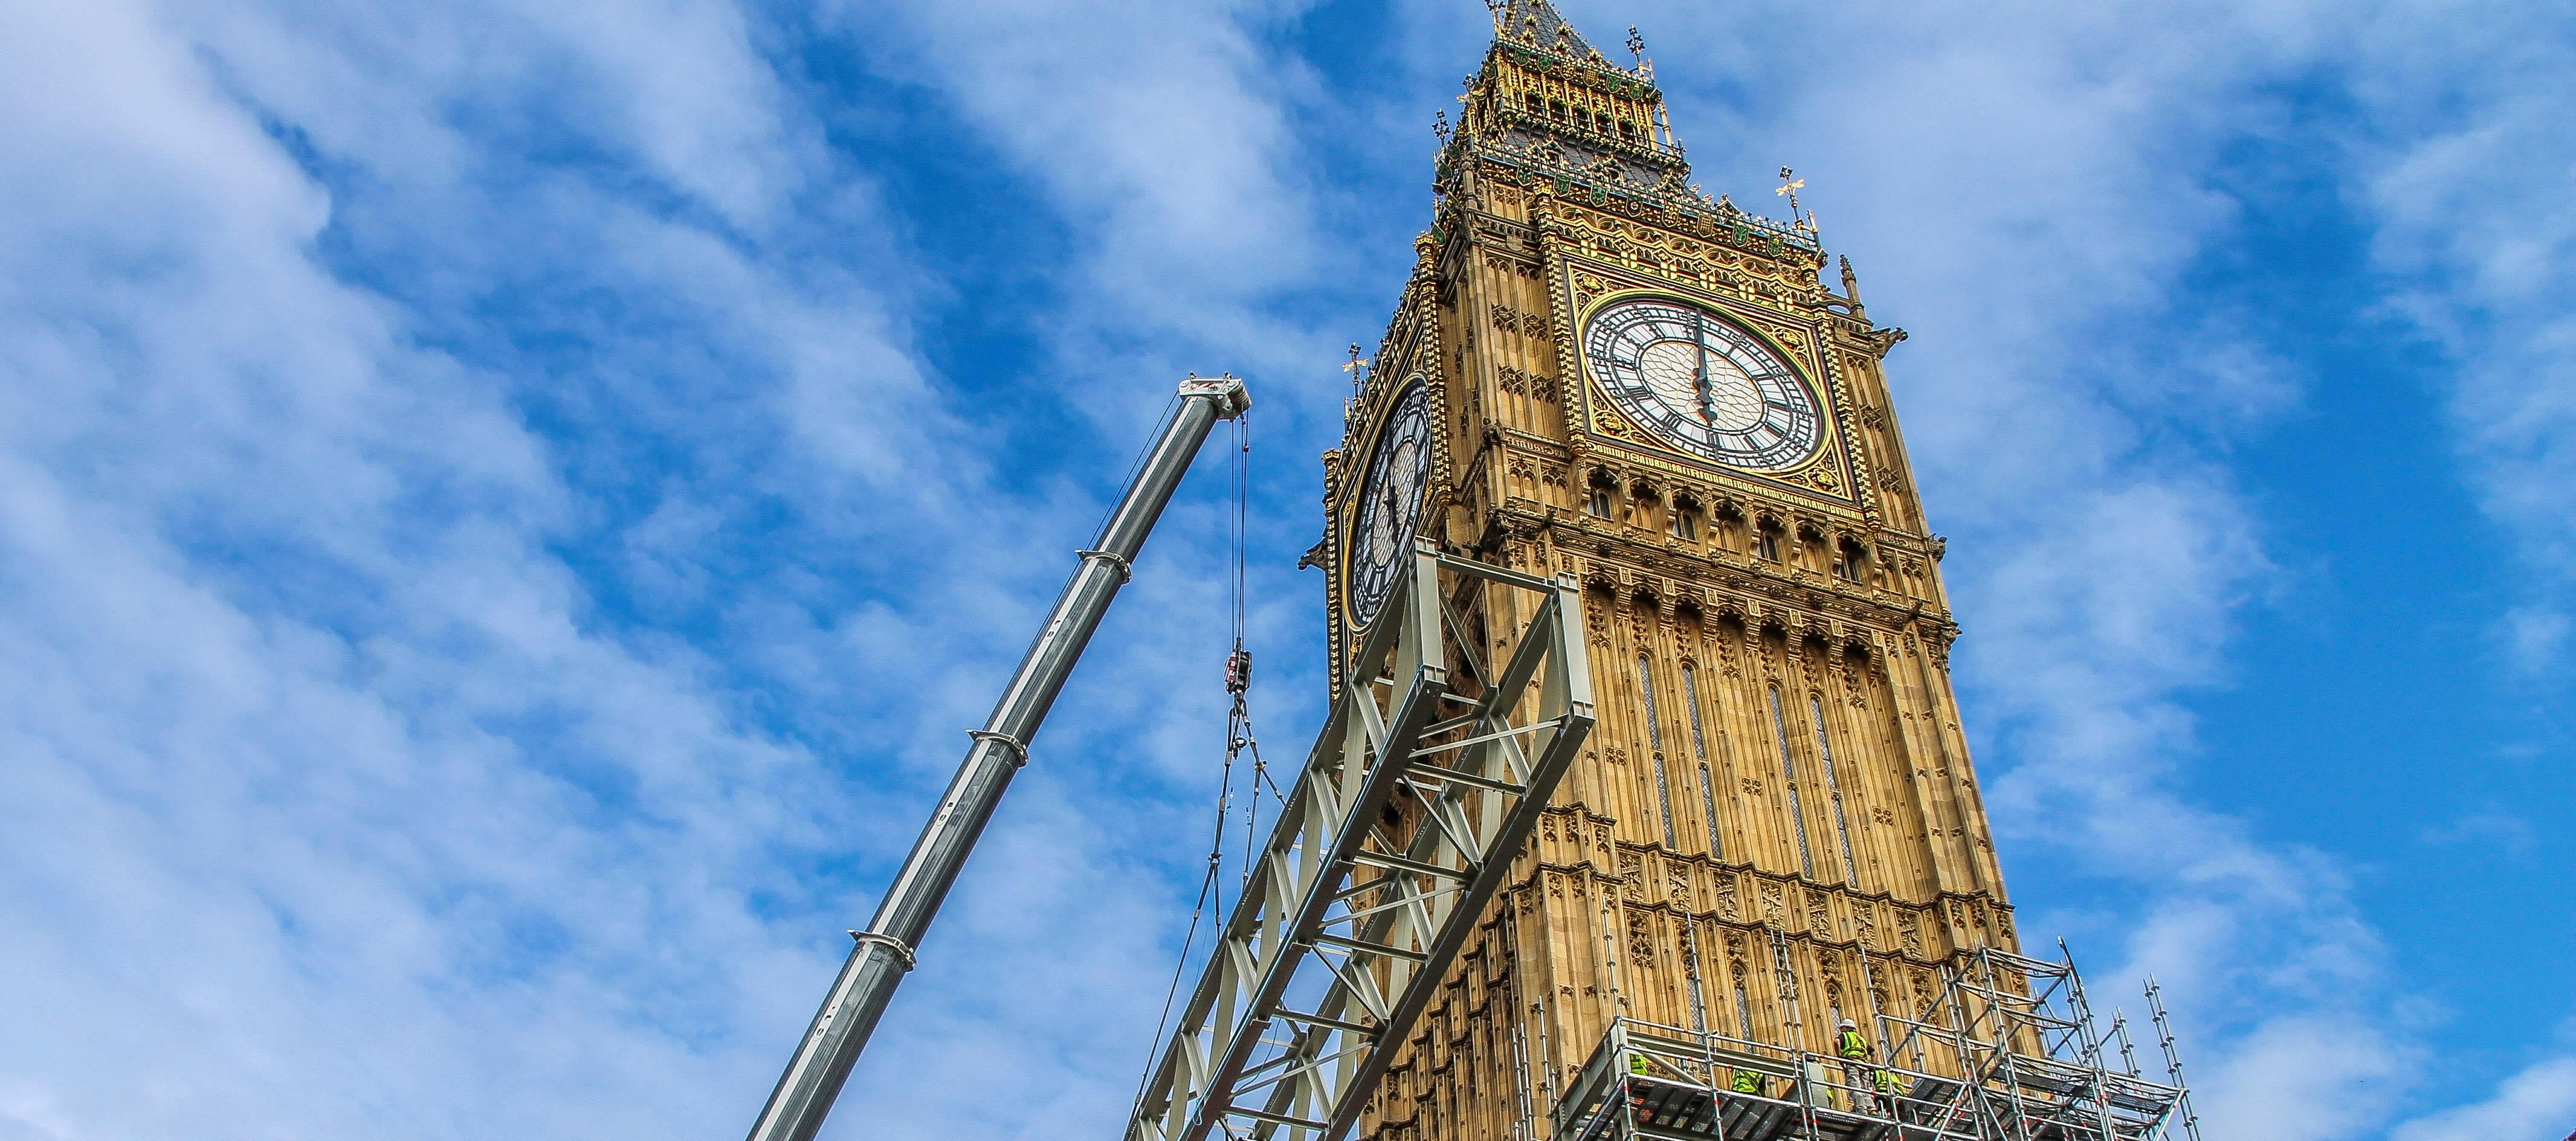 Proudly building Britain's future heritage - Sir Robert McAlpine